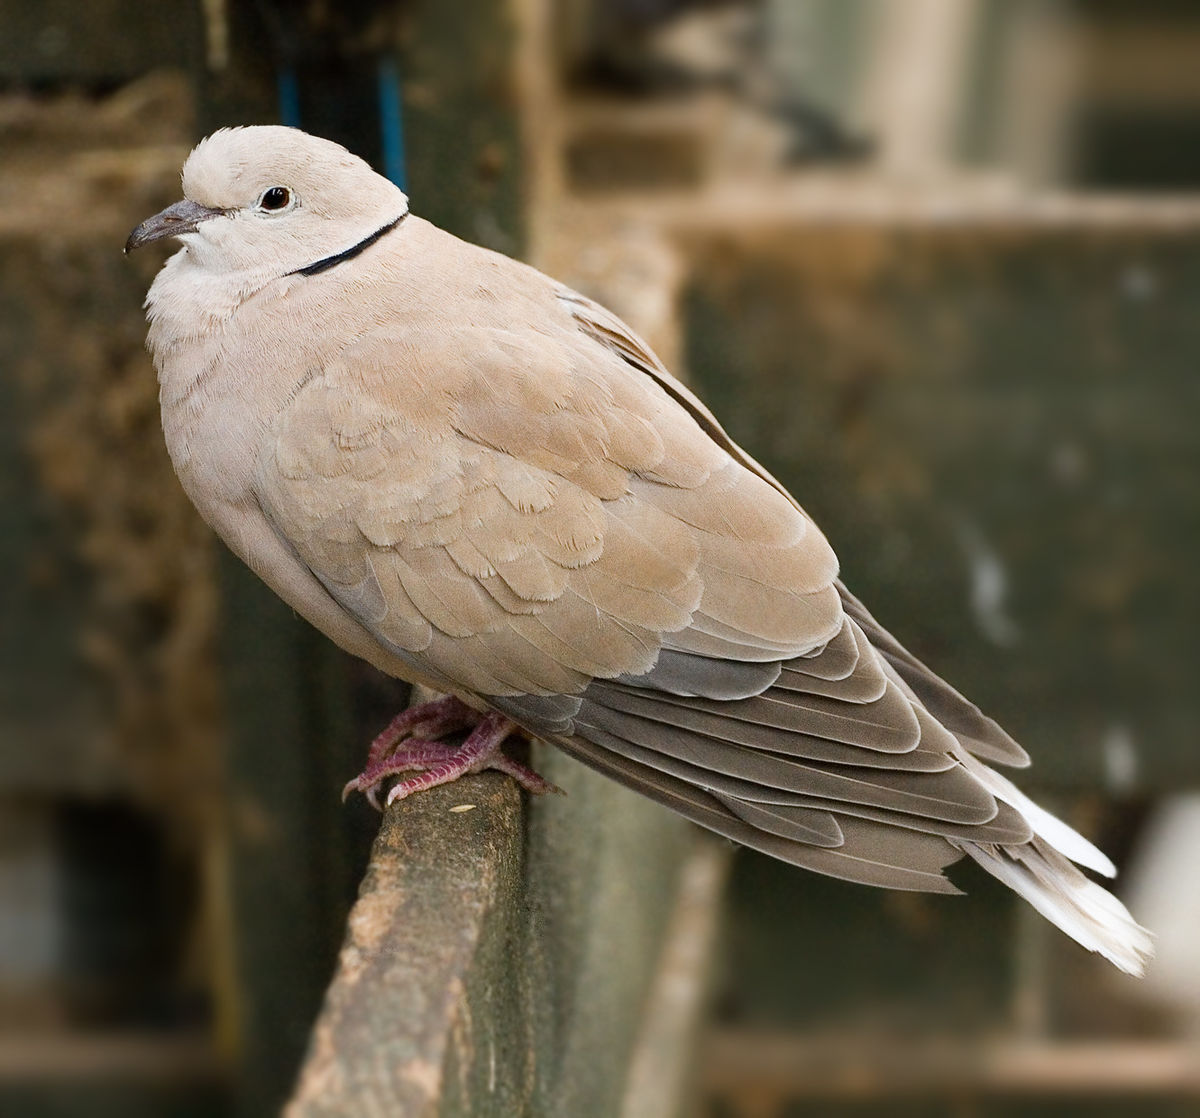 Barbary dove - Wikipedia